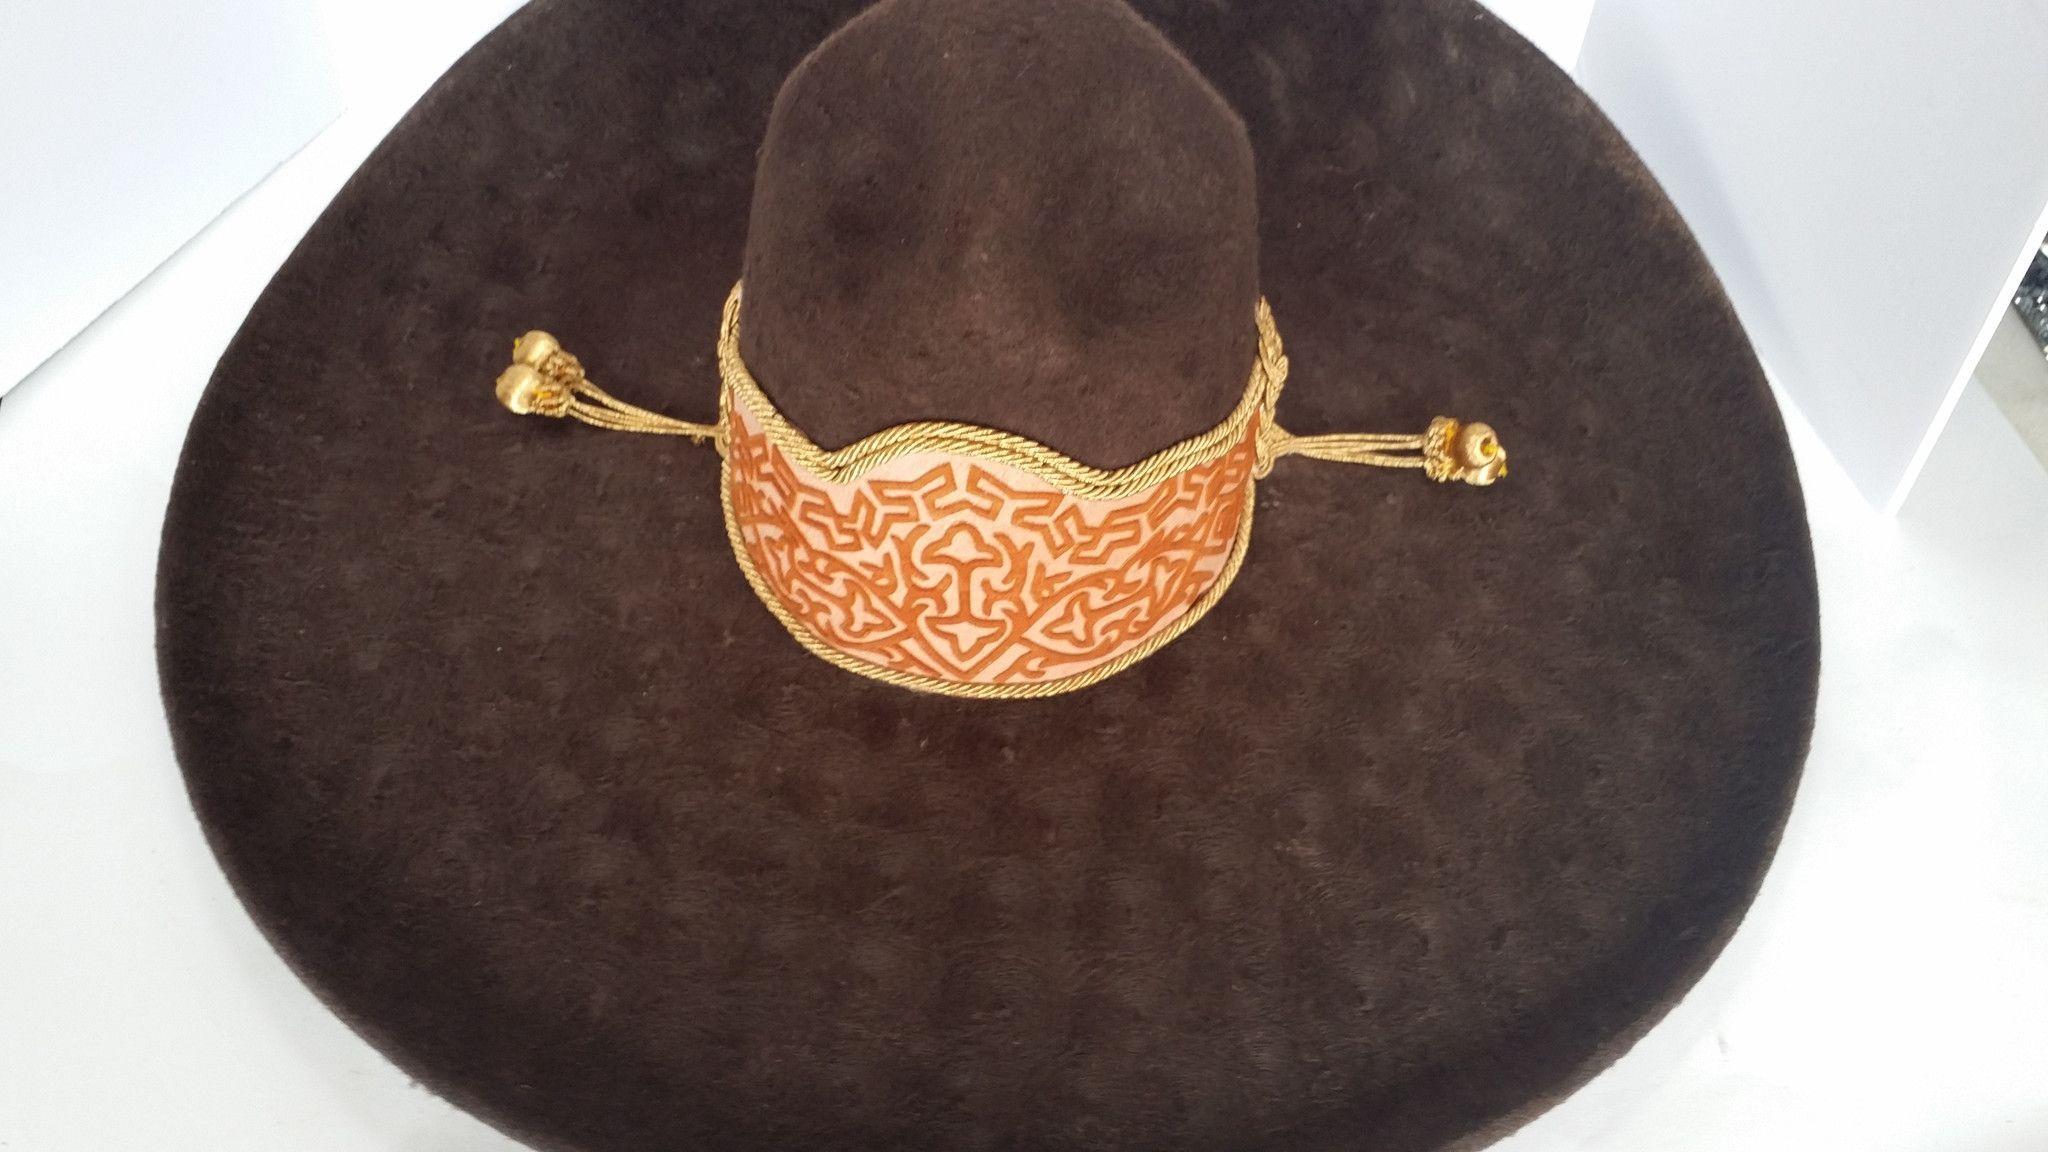 7da987f2ec4d5 Sombrero Charro de Lana. Color Beich Charro Hats 58 mex 7-1 4 ...